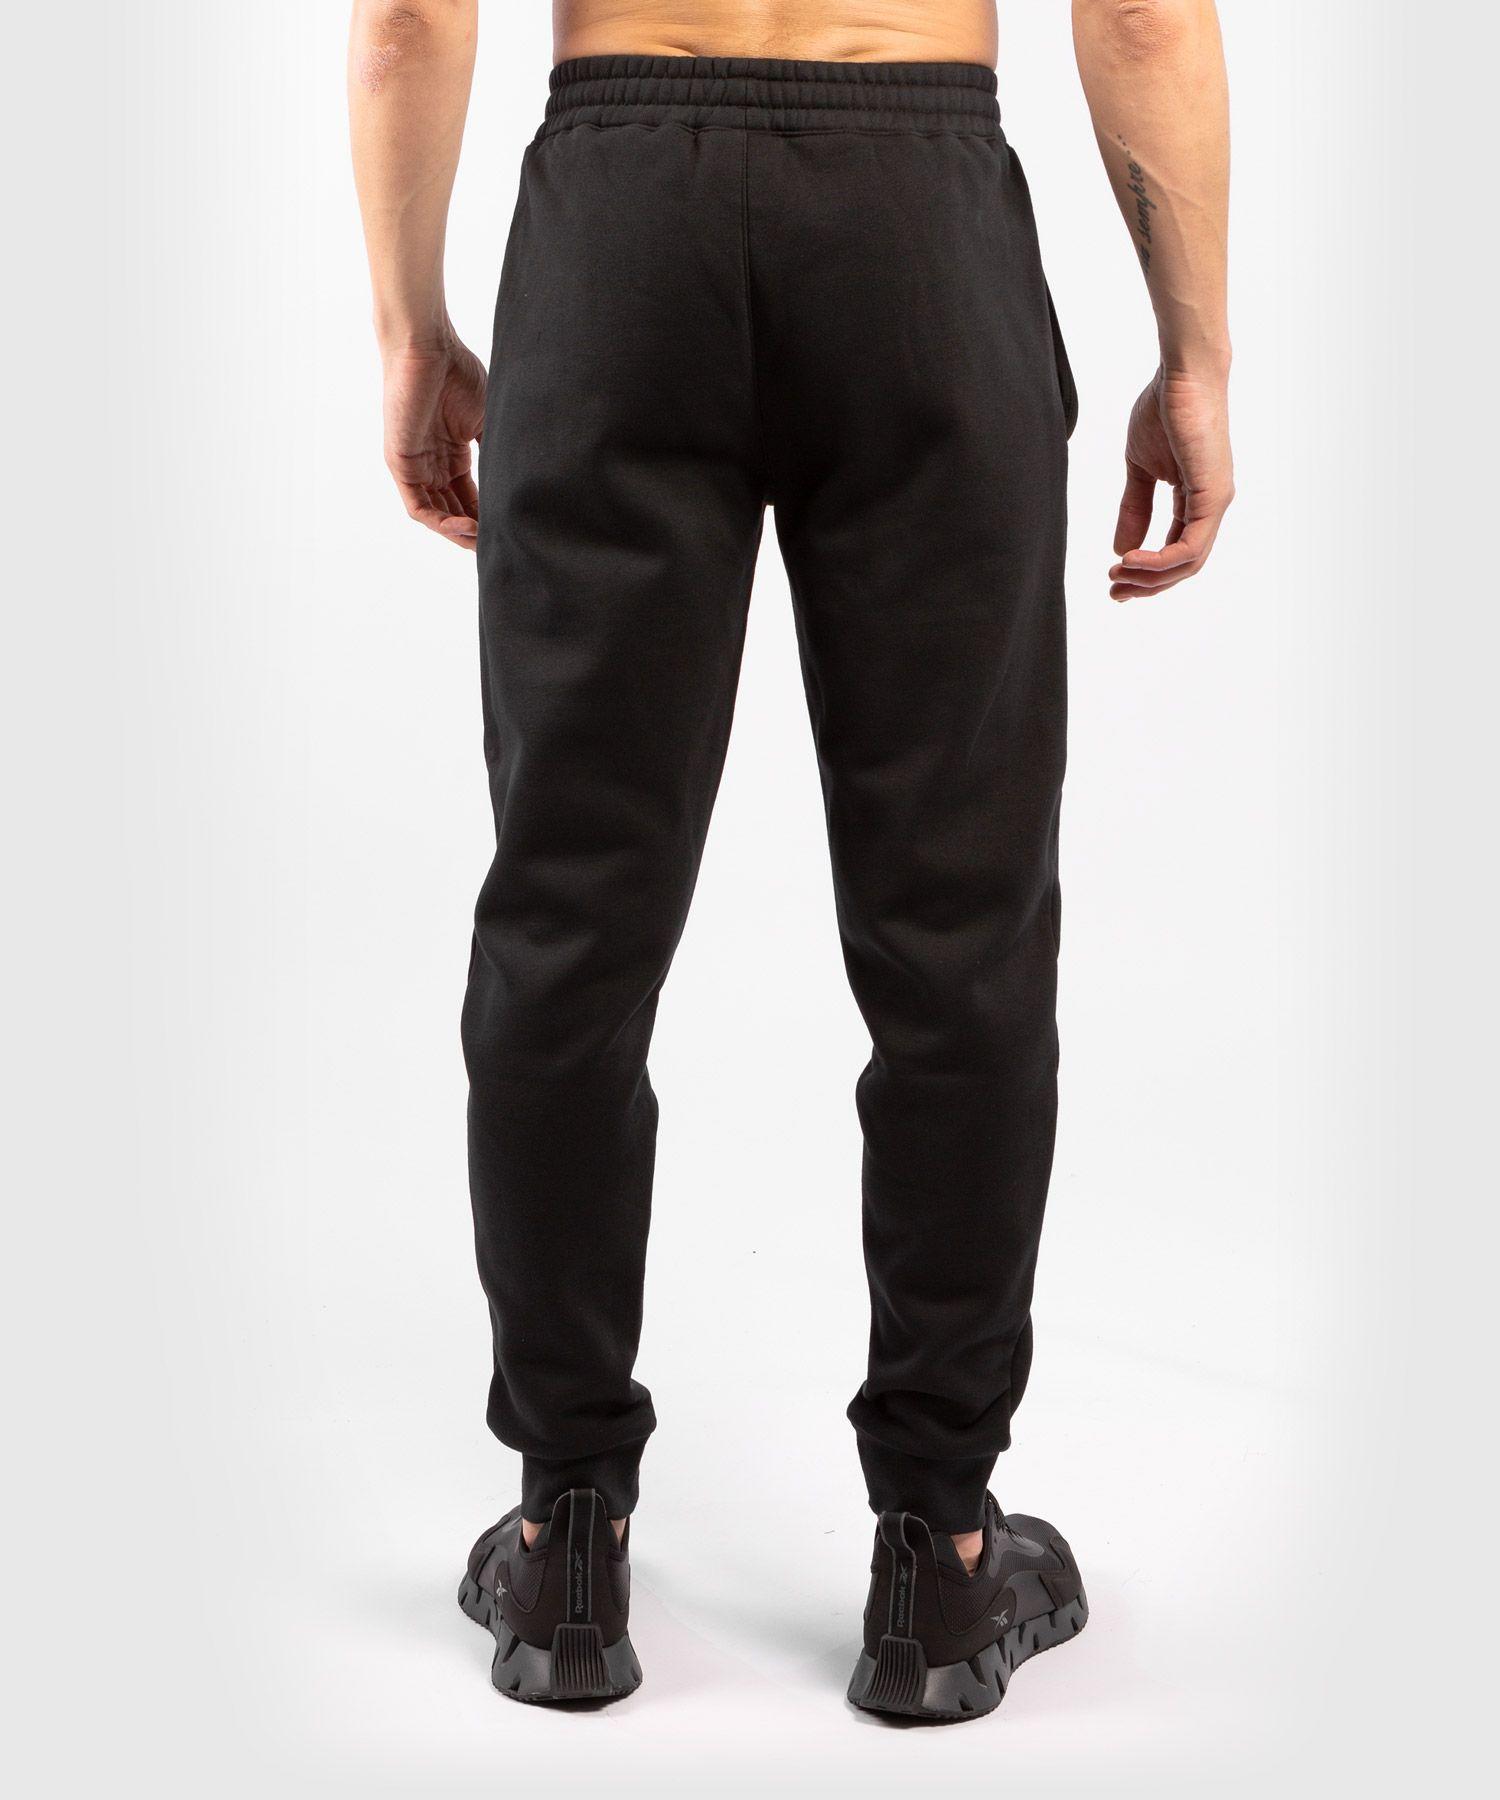 Мужские штаны UFC Venum Replica champion - Black XS